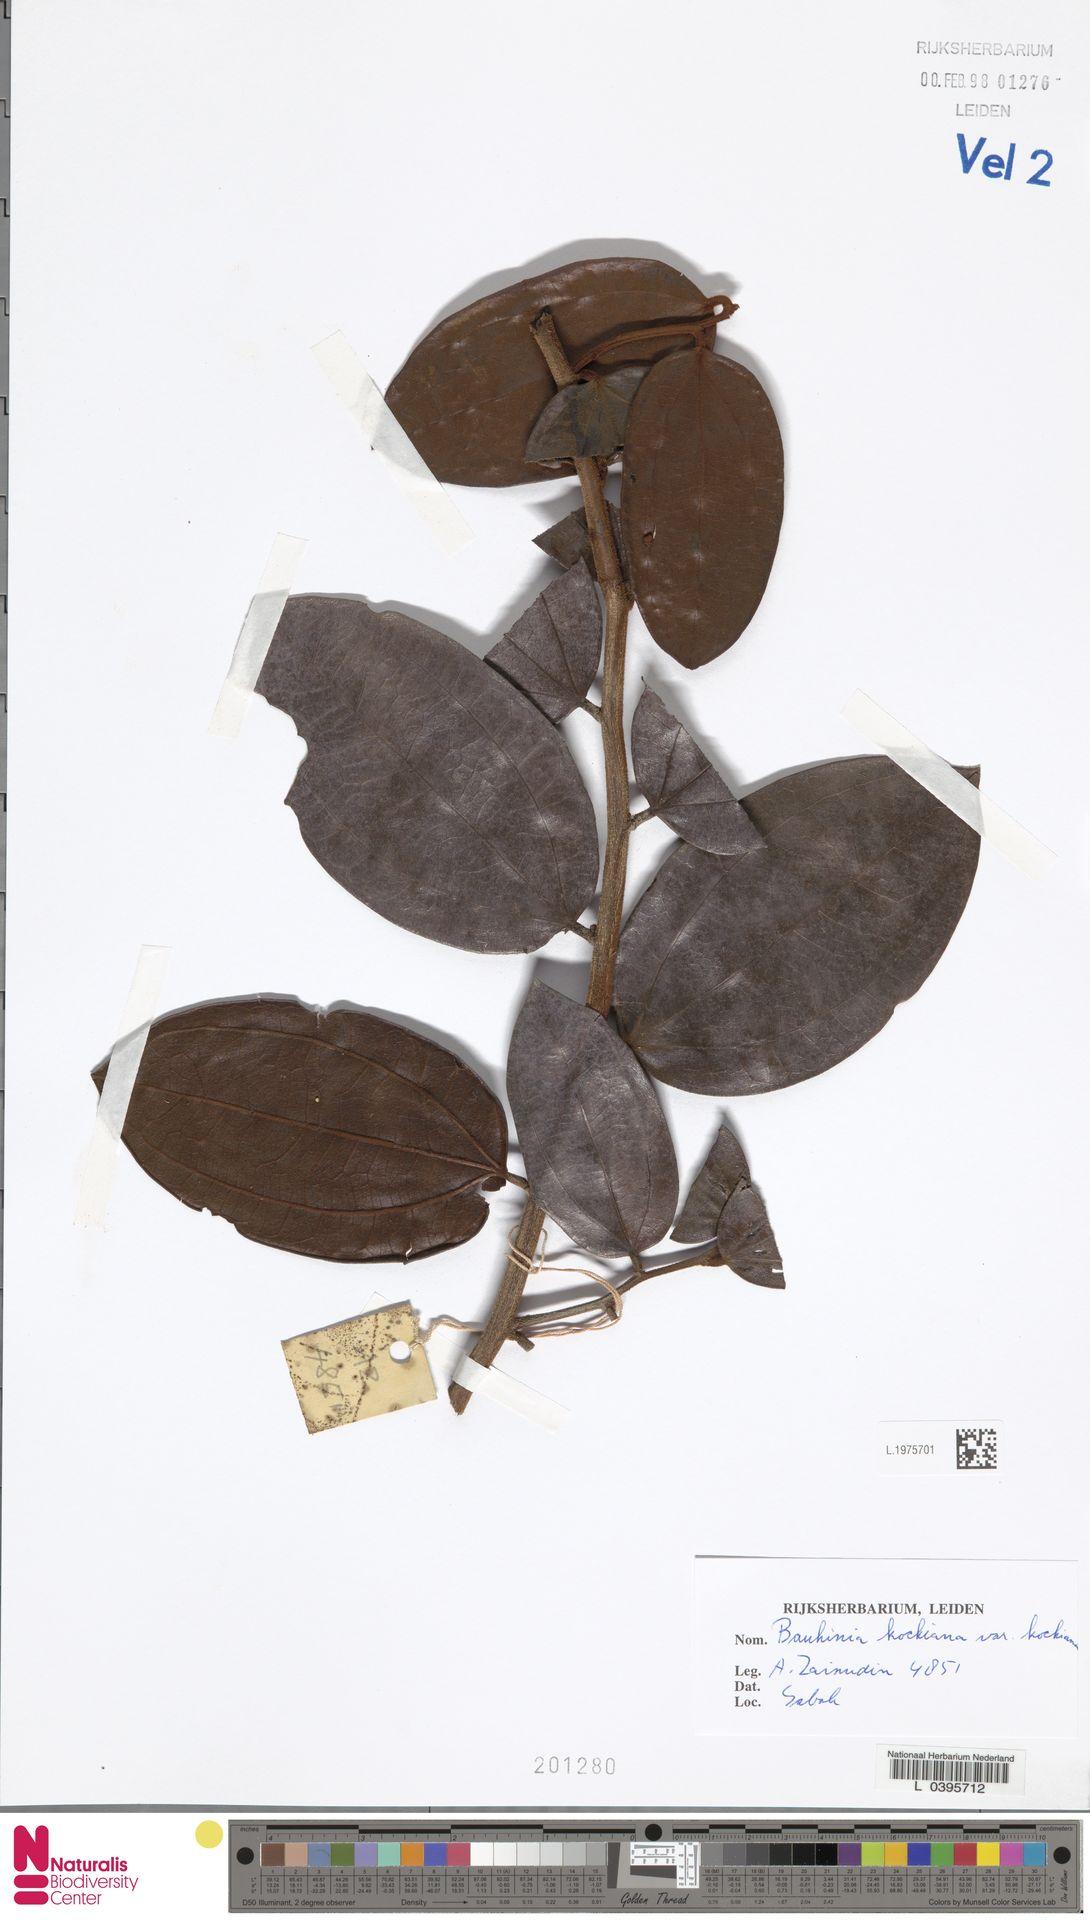 L.1975701 | Bauhinia kockiana var. kockiana